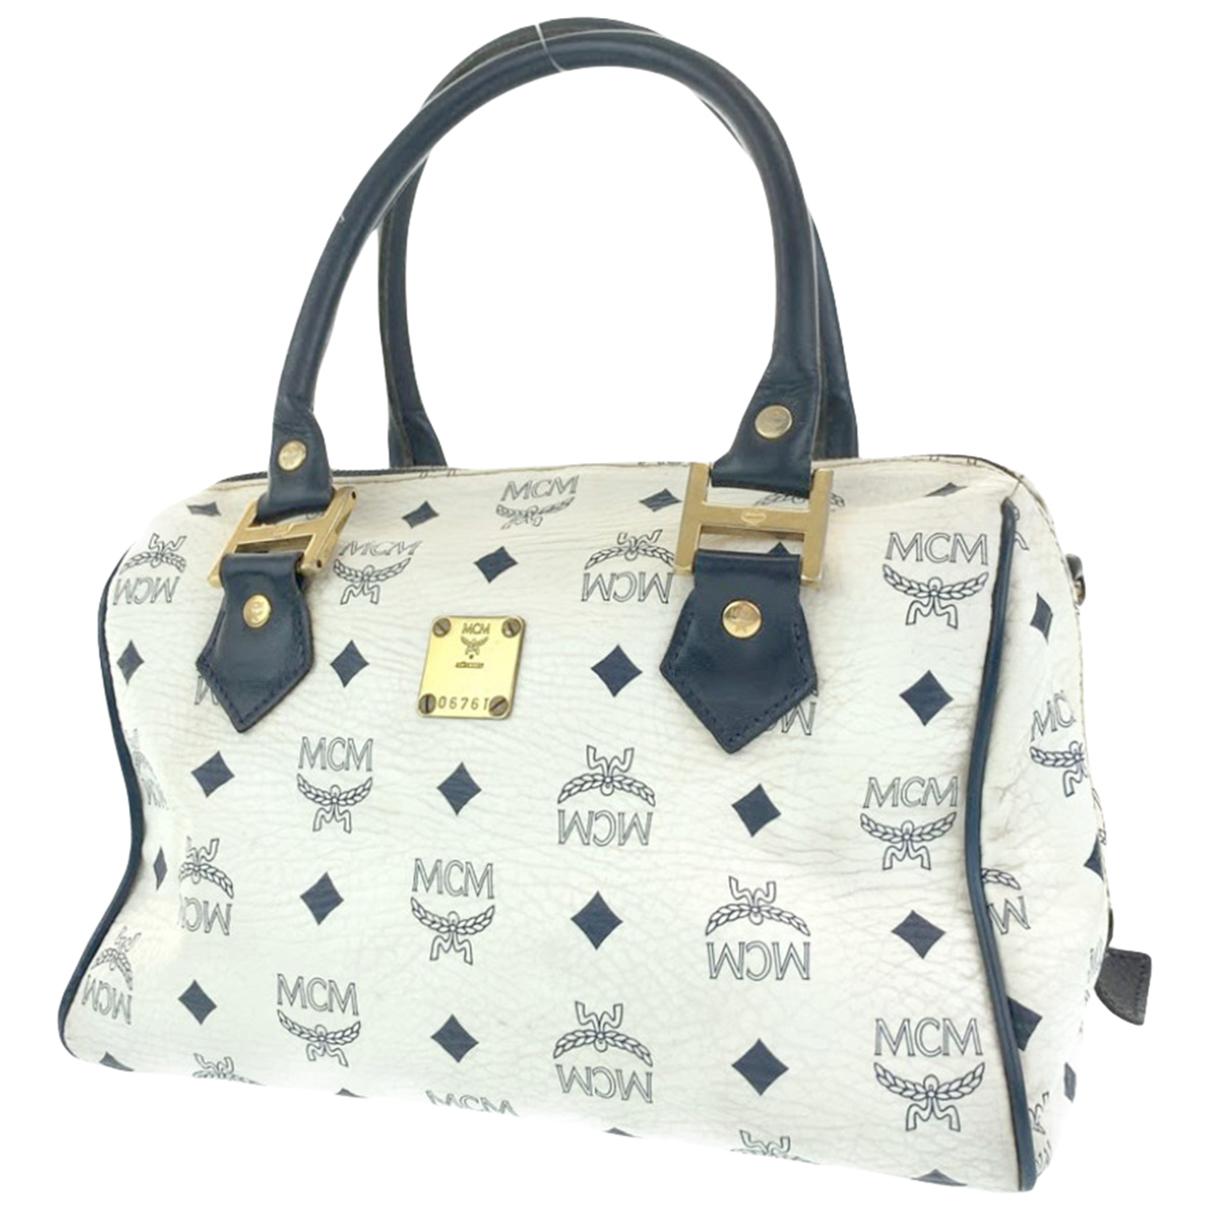 Mcm N Leather handbag for Women N